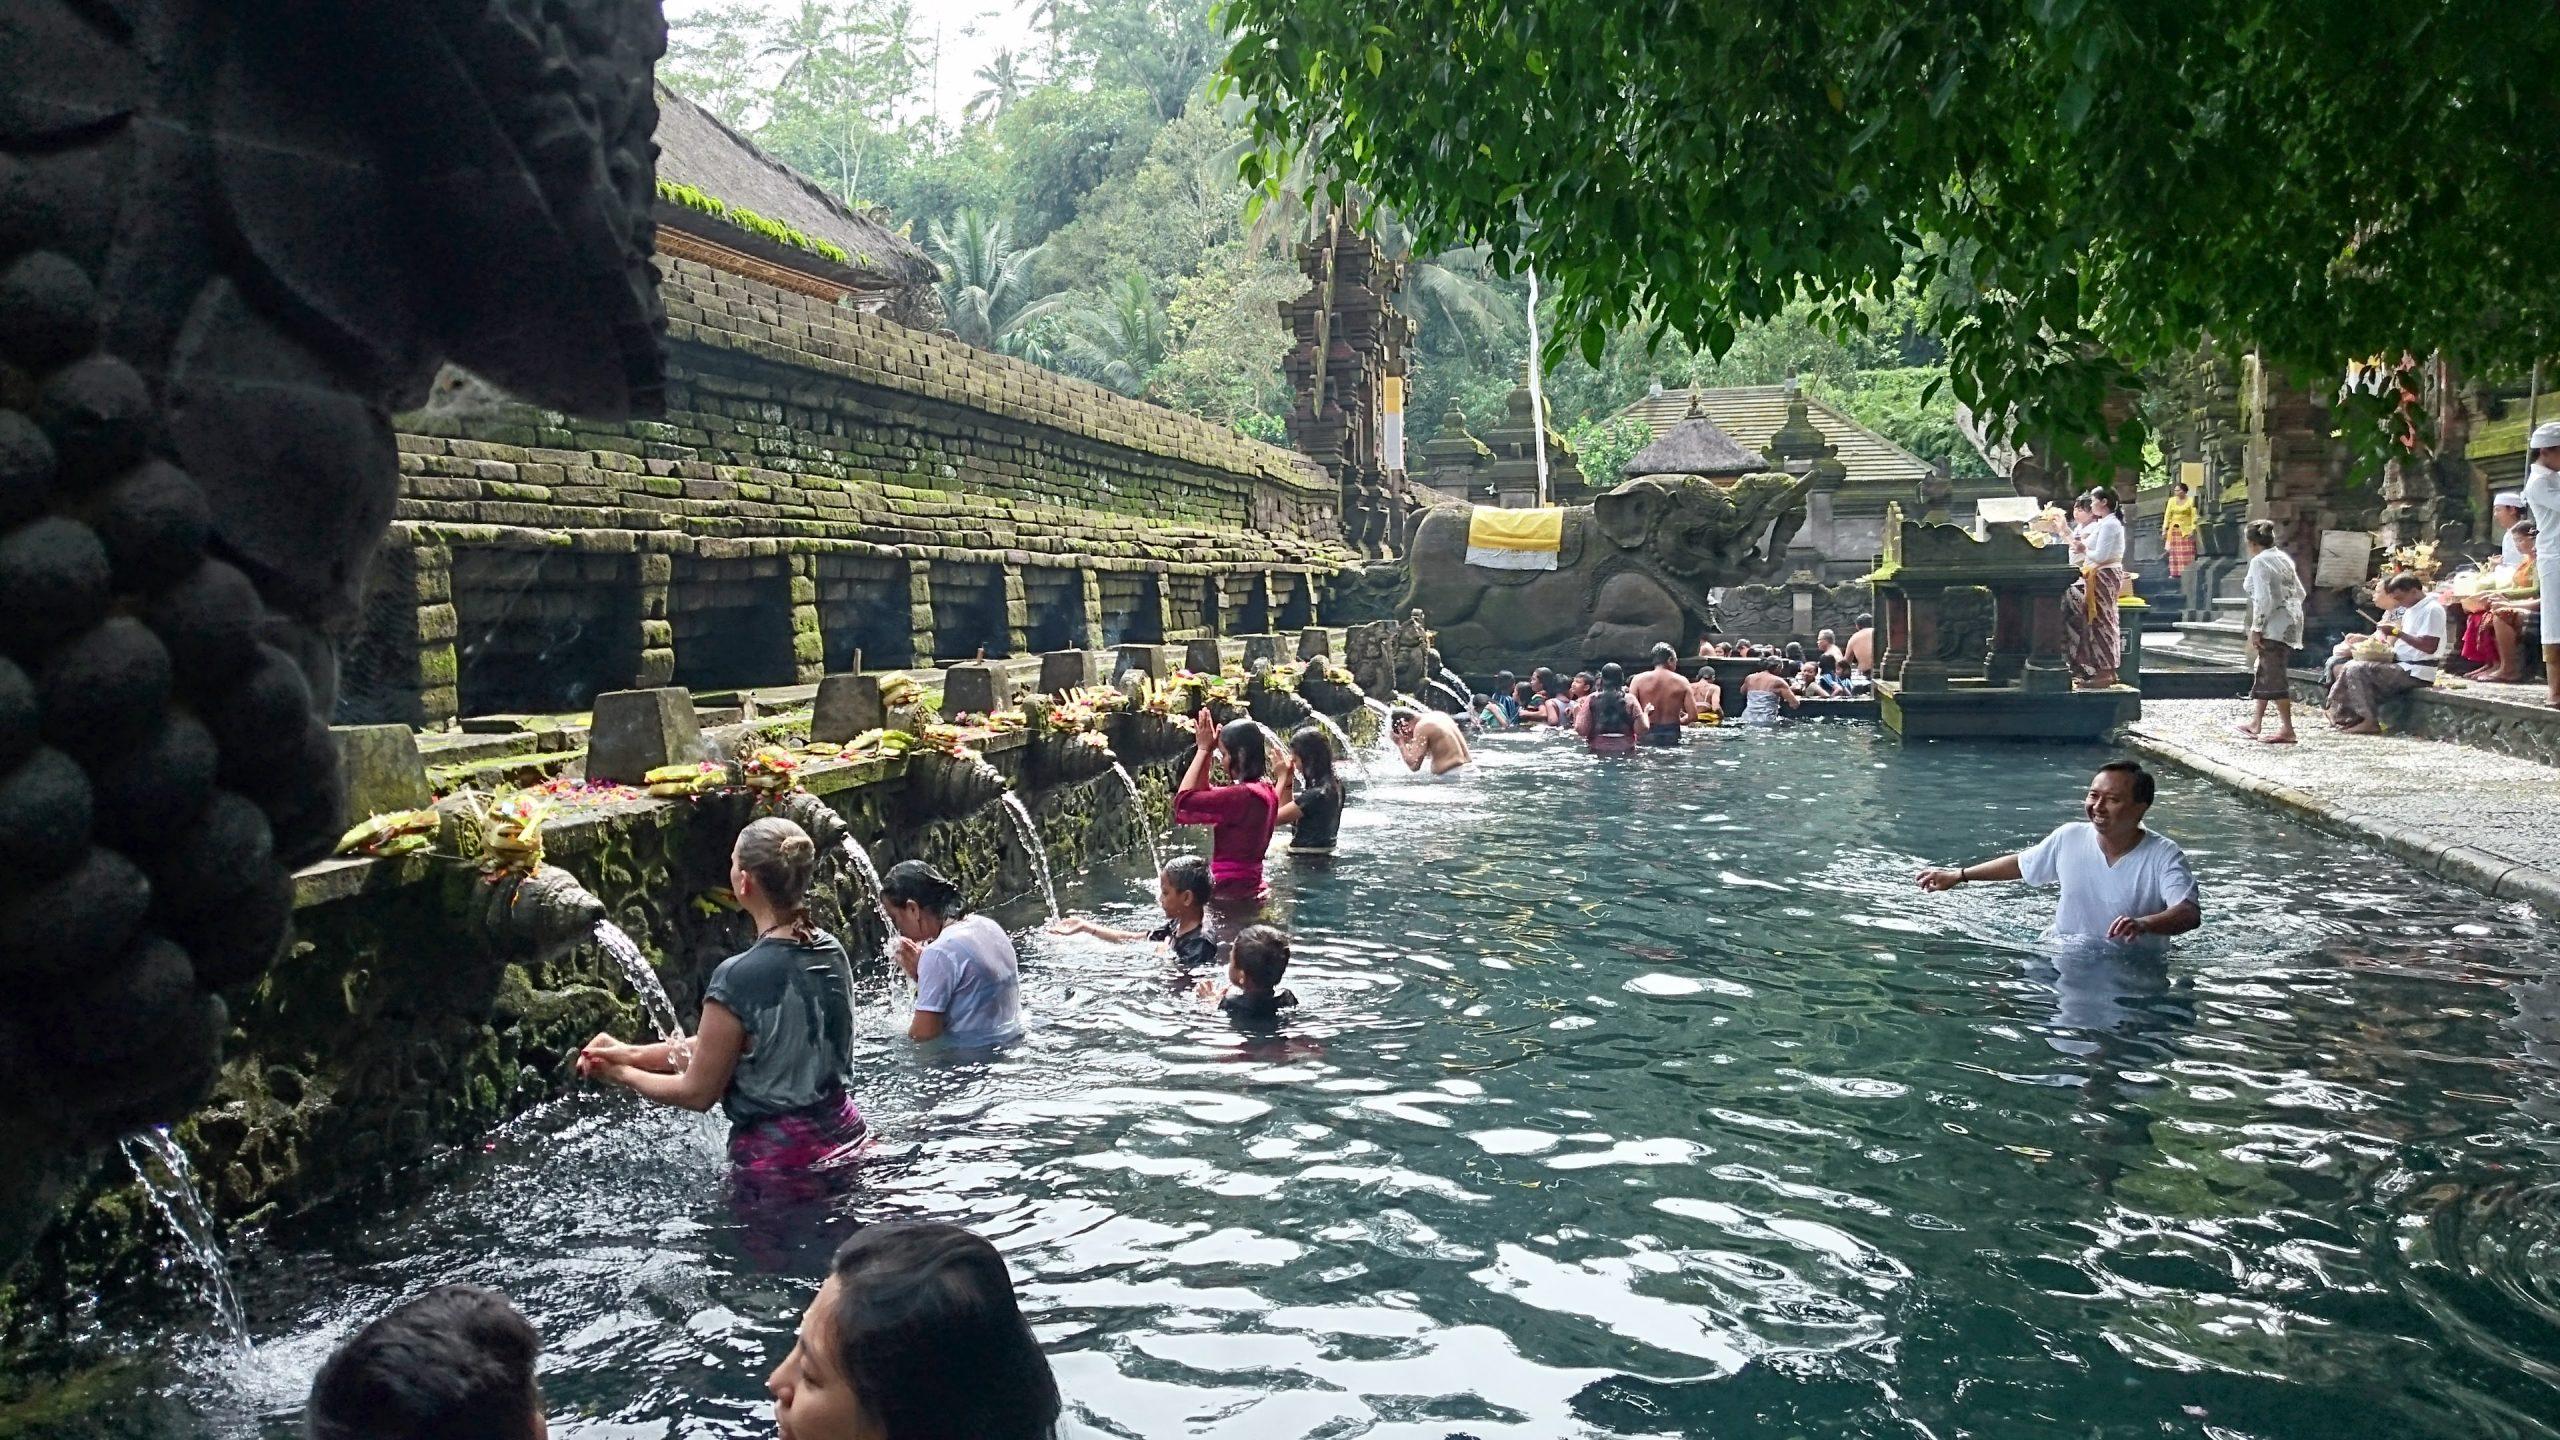 Paket Wisata Bali 3 Hari 2 Malam - WisataMu